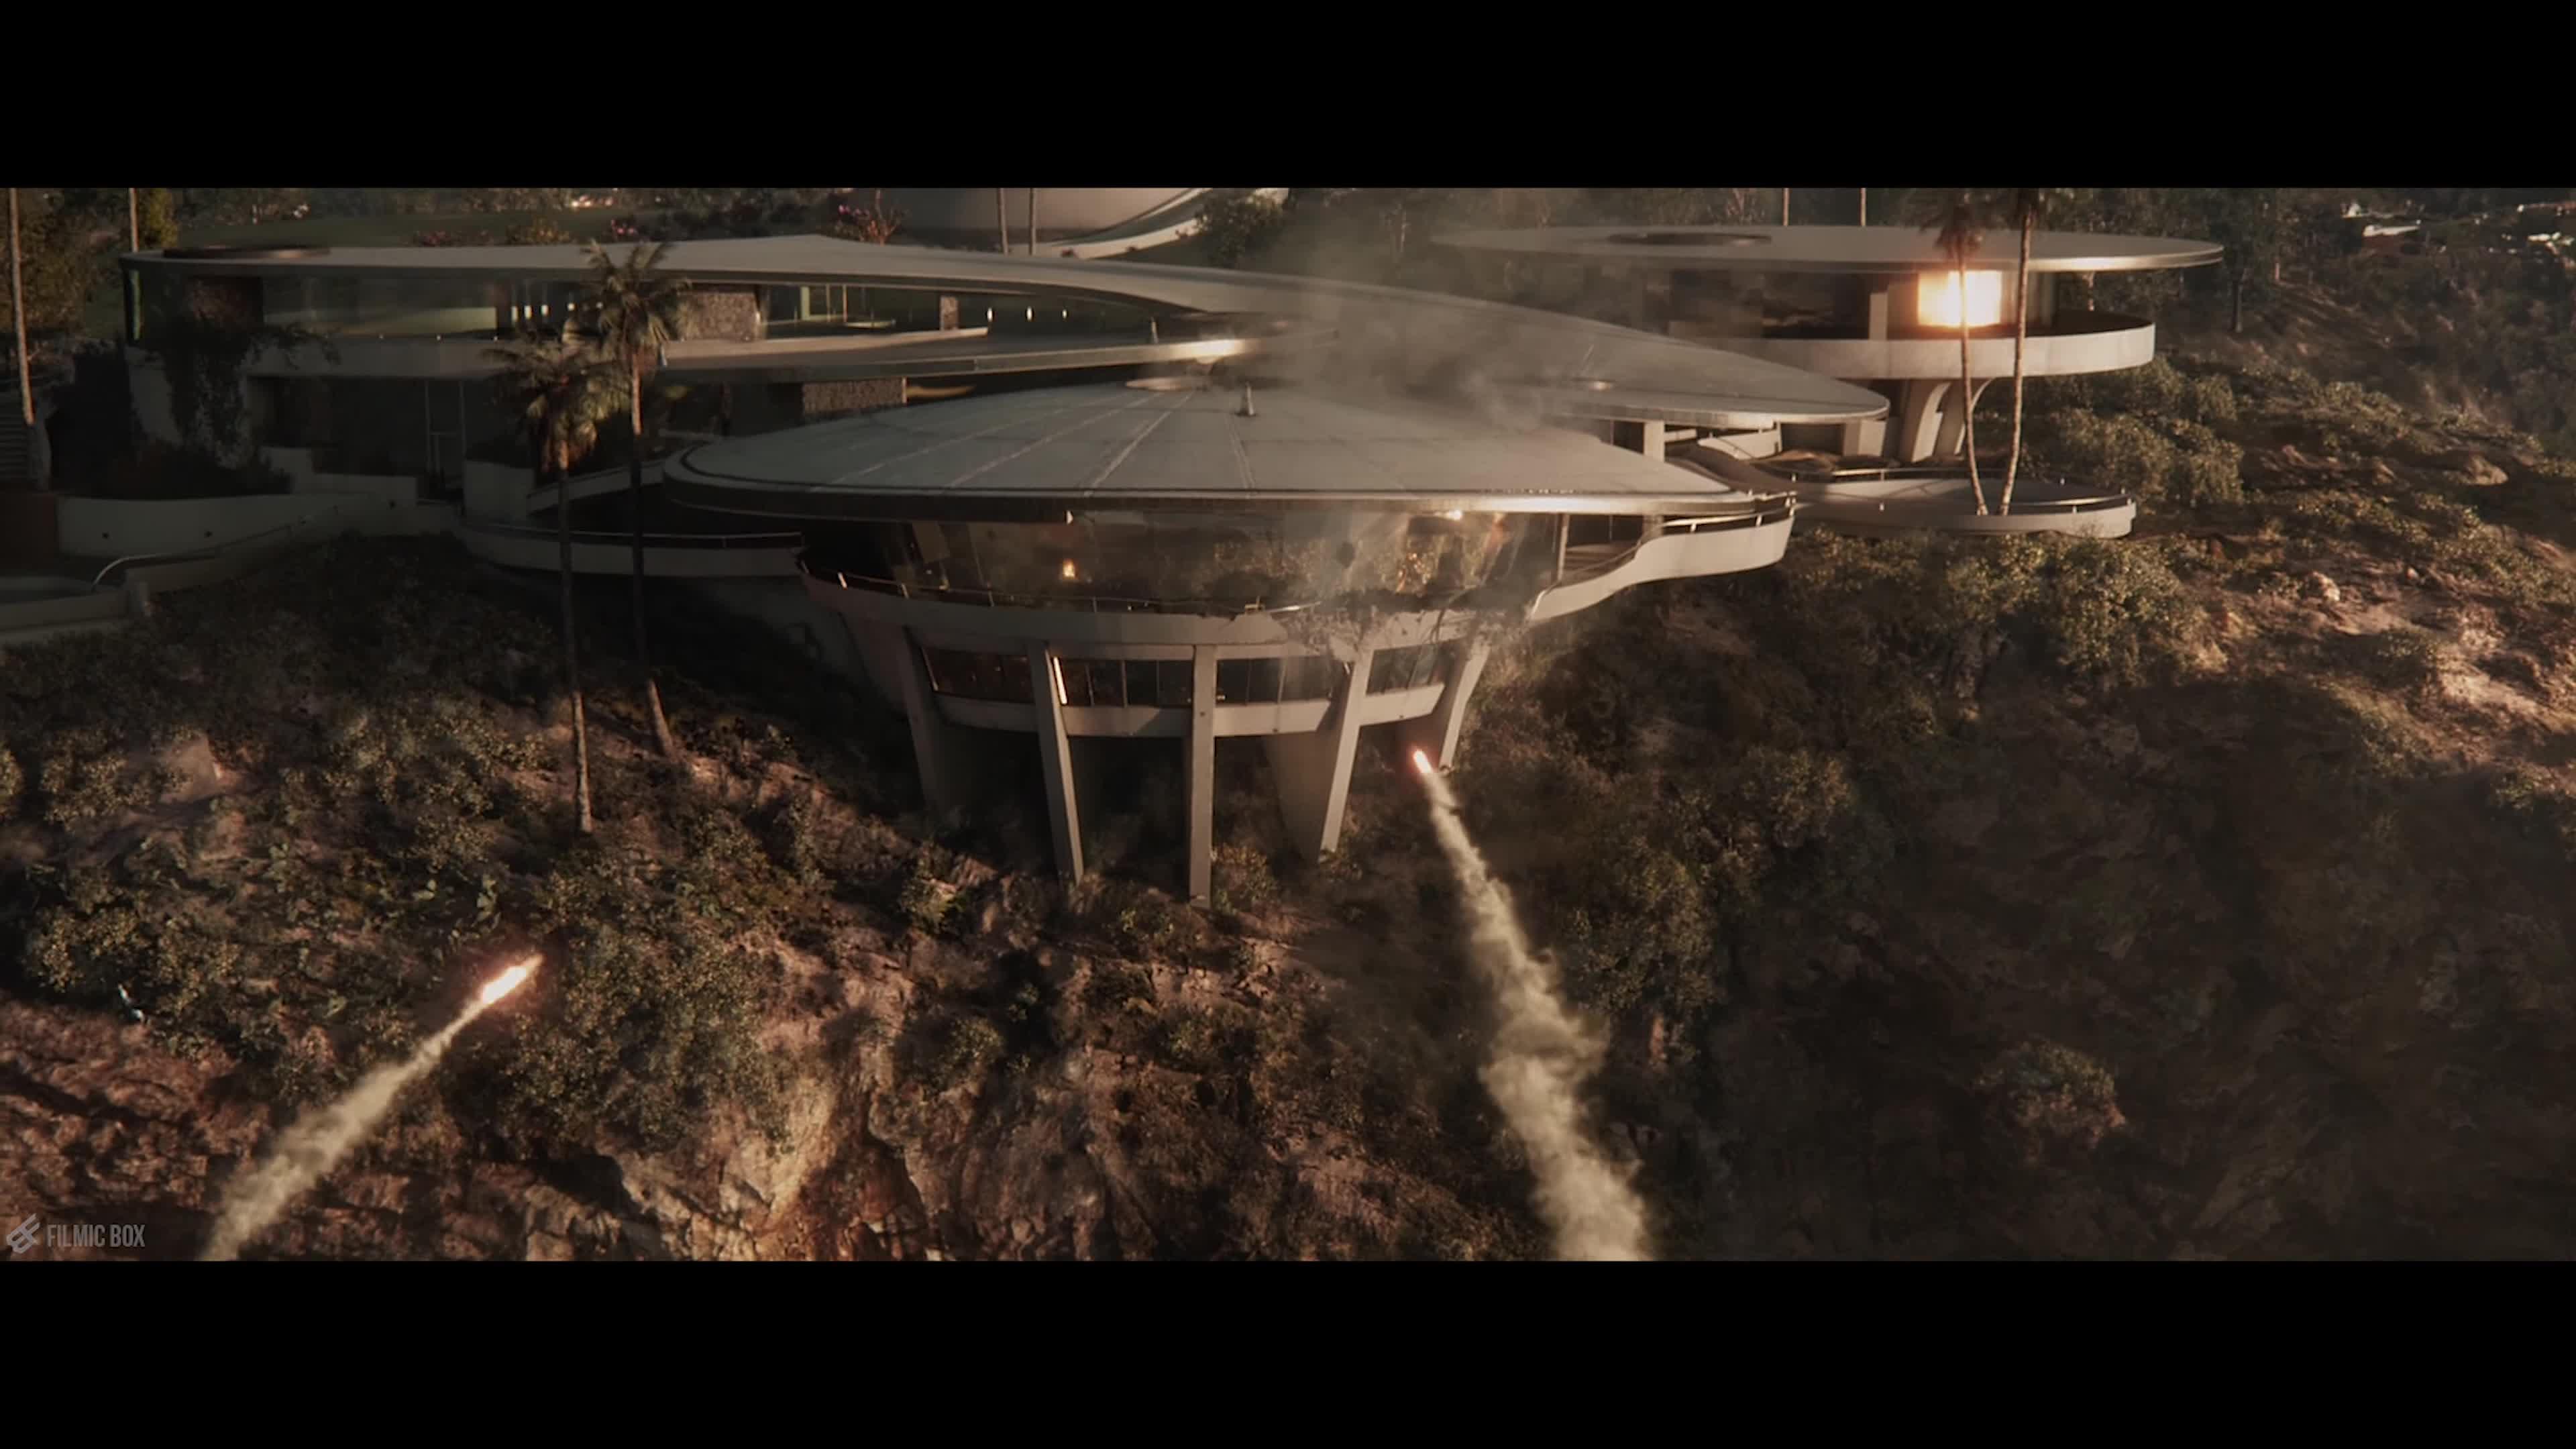 Malibu Mansion Attack Iron Man 3 2013 Movie Clip